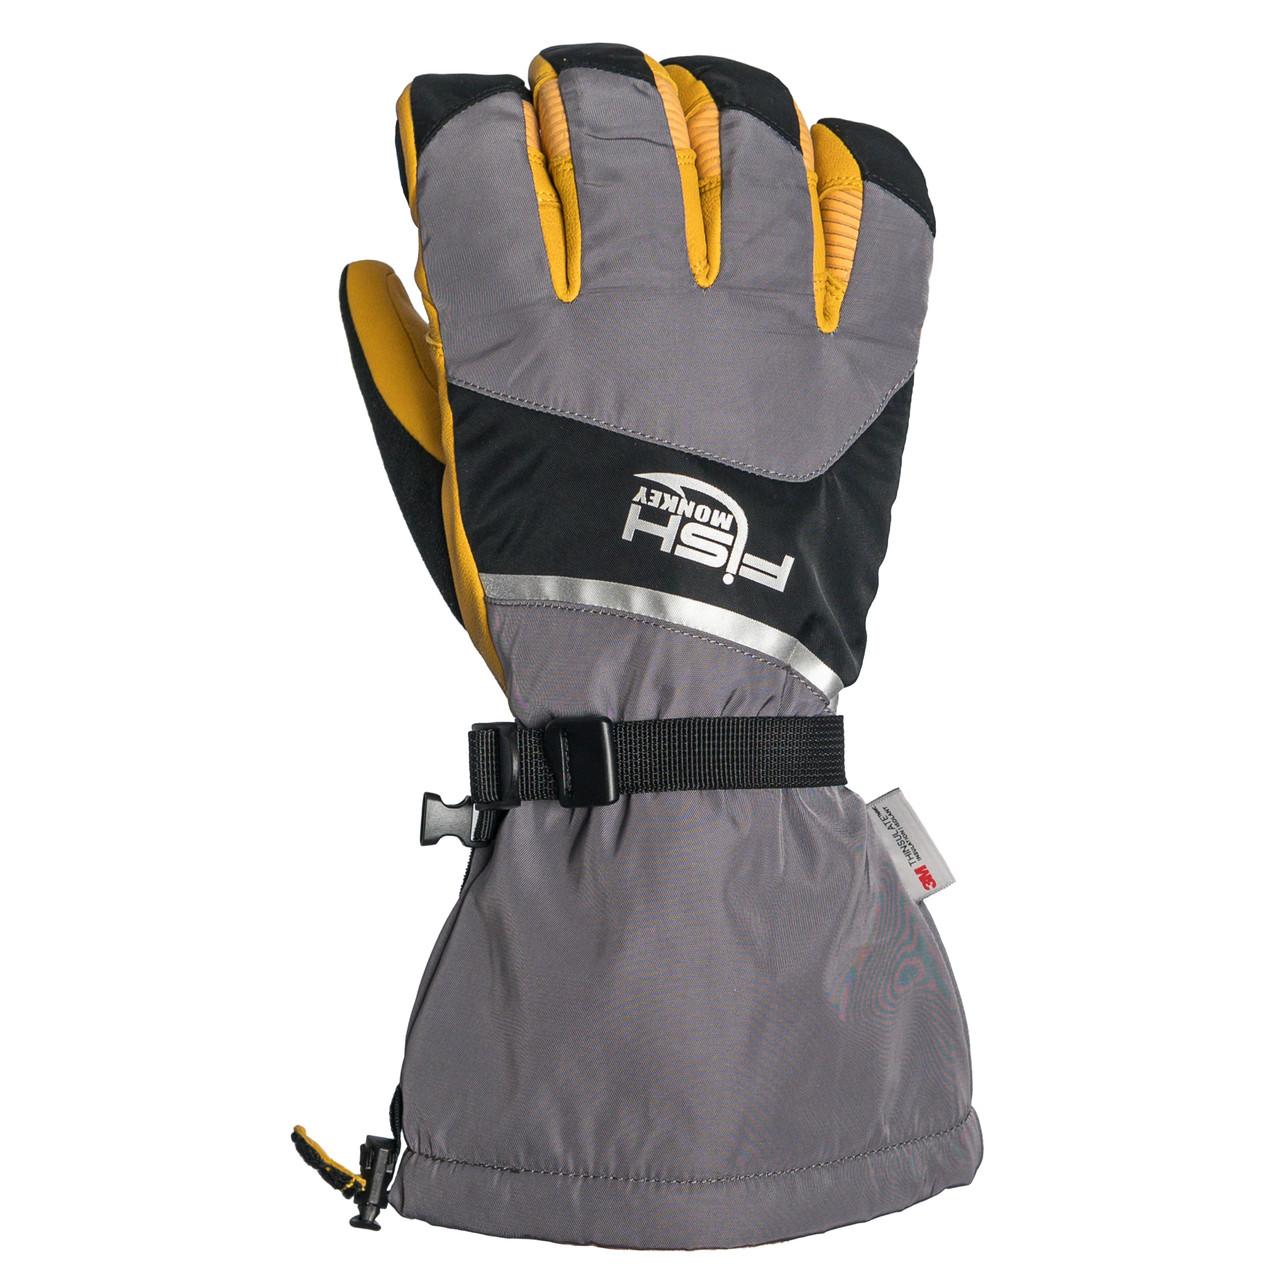 Fish Monkey FM37 Men's Yeti Premium Ice Fishing Gloves